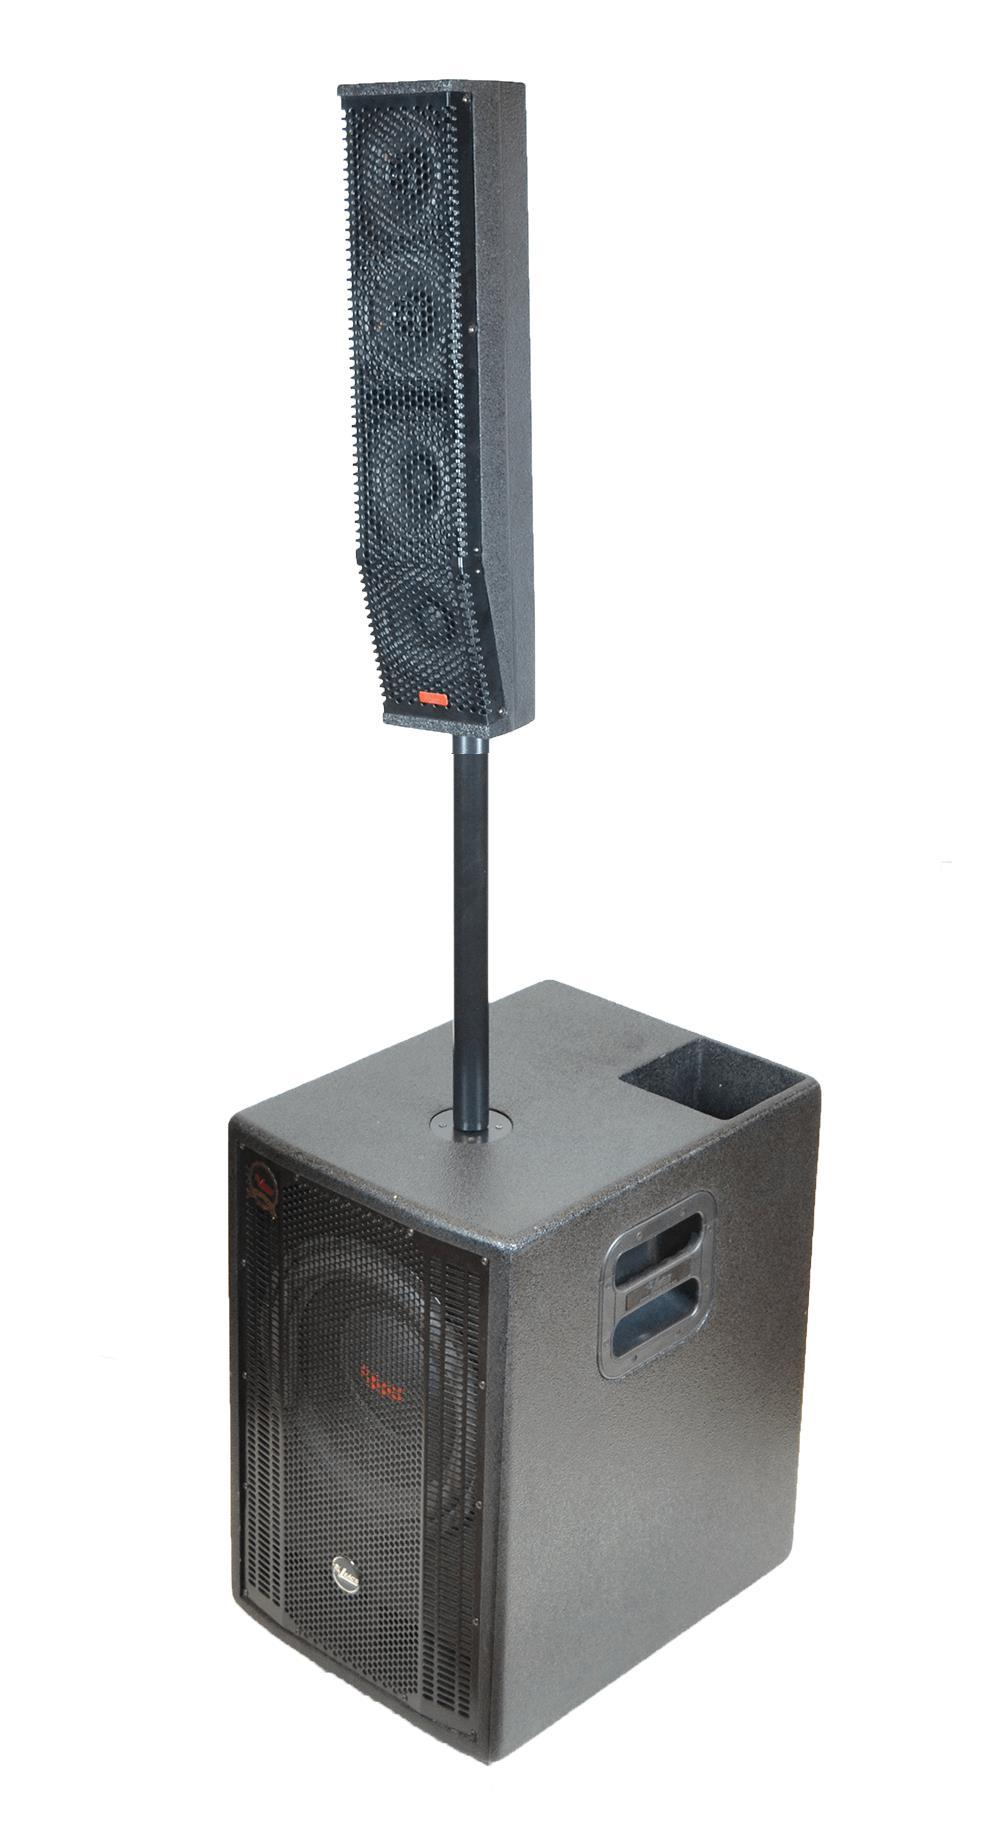 "Sistema PA Ativo Leacs System Pack 1000 (Bi-Ampli 500+500w RMS/SUB 12"")"